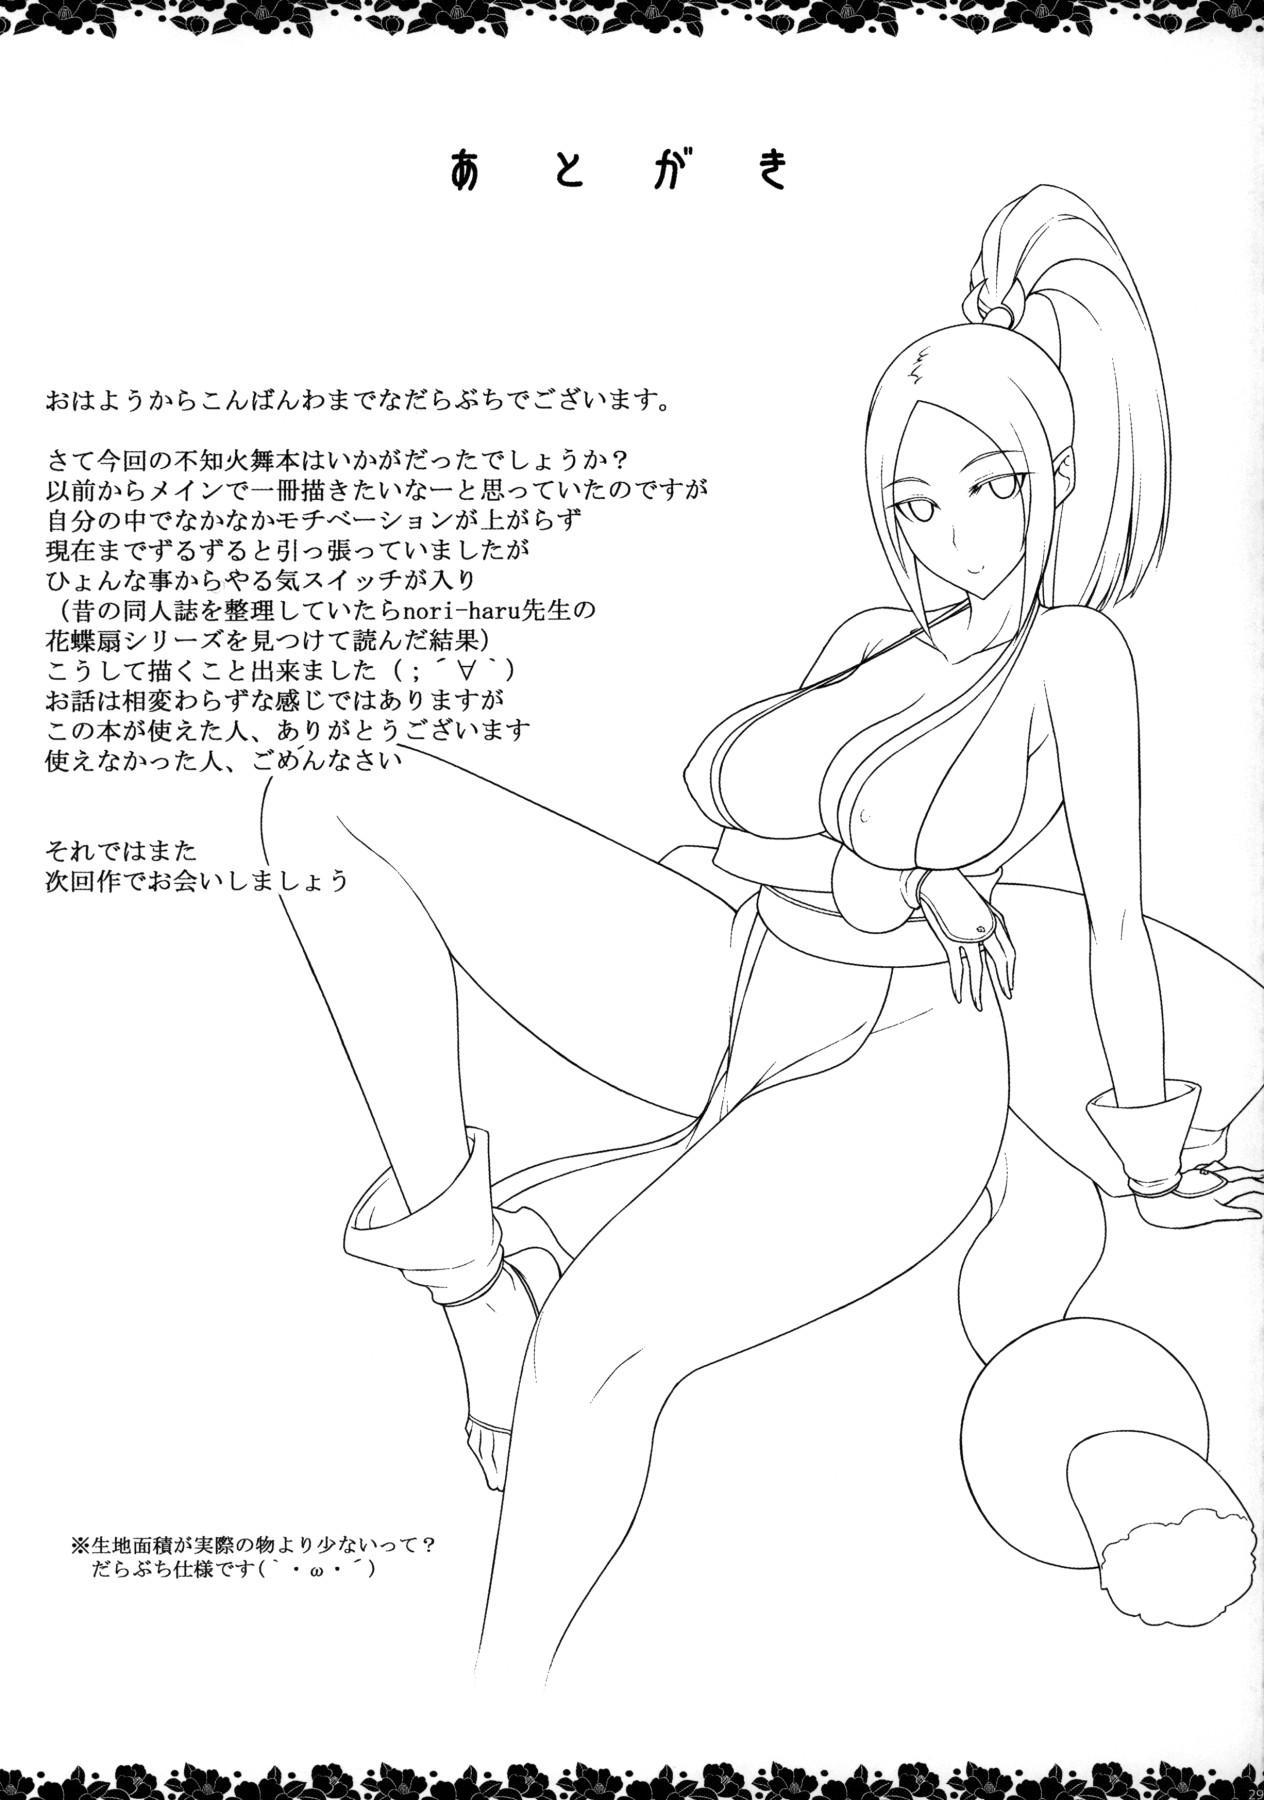 Daraku no hana | Flower of depravity 27